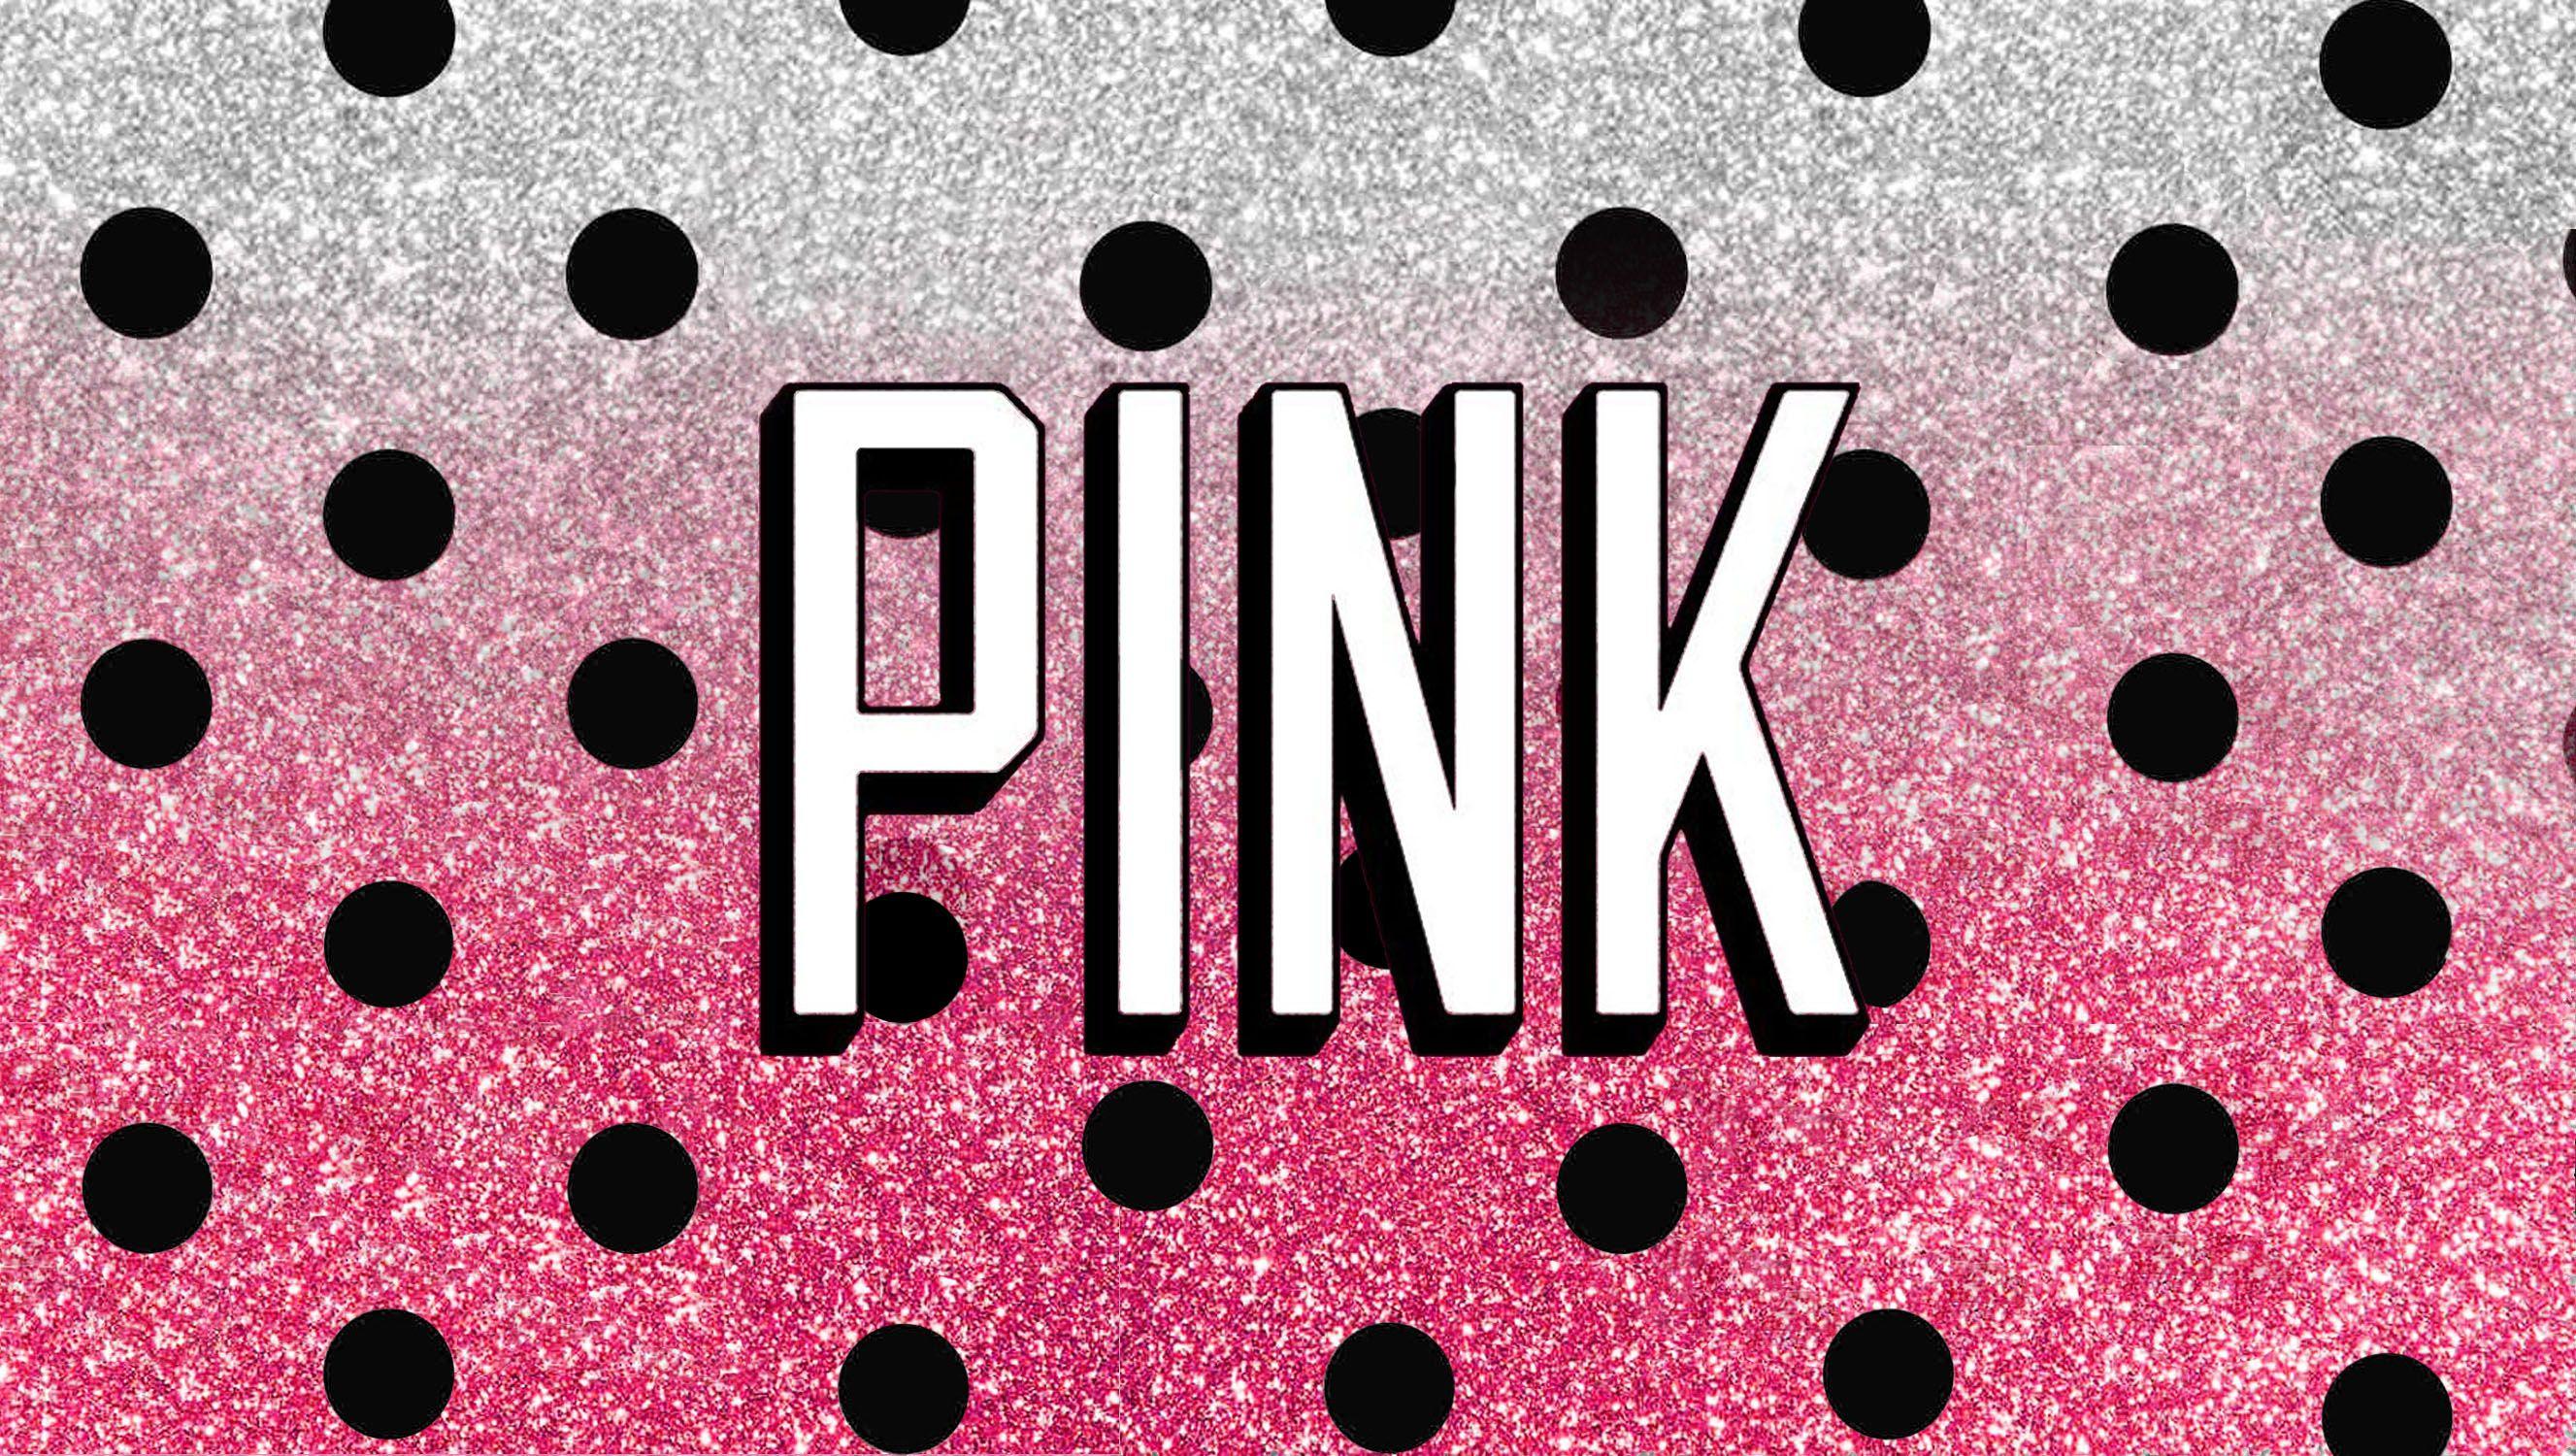 Victoria secret love pink background pink galaxy for Victoria secret wallpaper for room